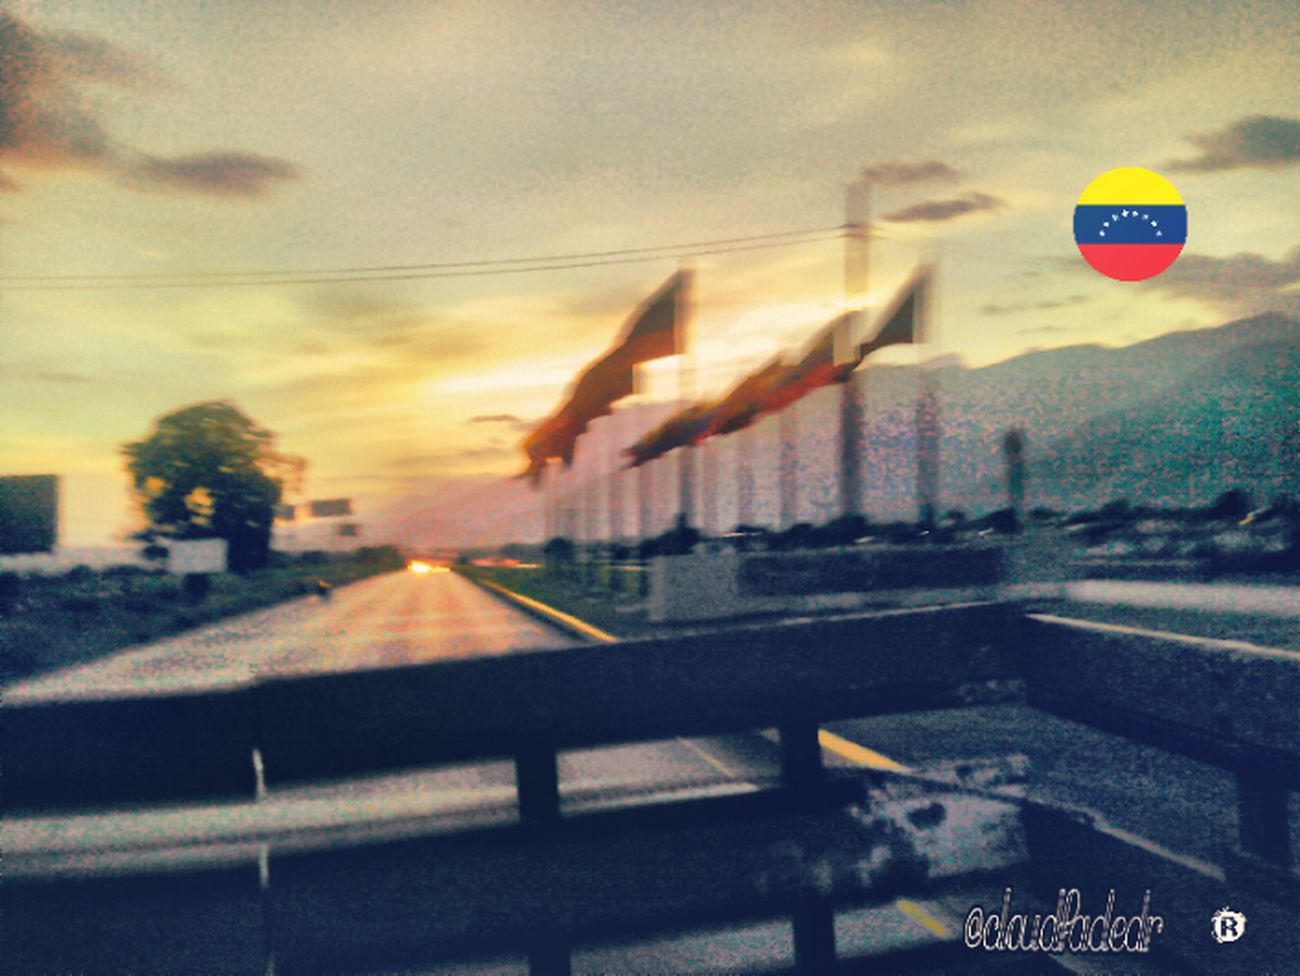 City Building Exterior Cloud - Sky Cityscape Day EyeEm Gallery Tranquility Fotos Venezuela Venezuela_captures Foto Venezuela❤️ Fotografosvenezolanos FotoDelDia Fotografica First Eyeem Photo Fotos Populares Eyeemphotography EyeEm Venezuela - Aragua VenezuelanPhotographer Paisajes Naturales CLOUD FADED Nature Horizon Over Water